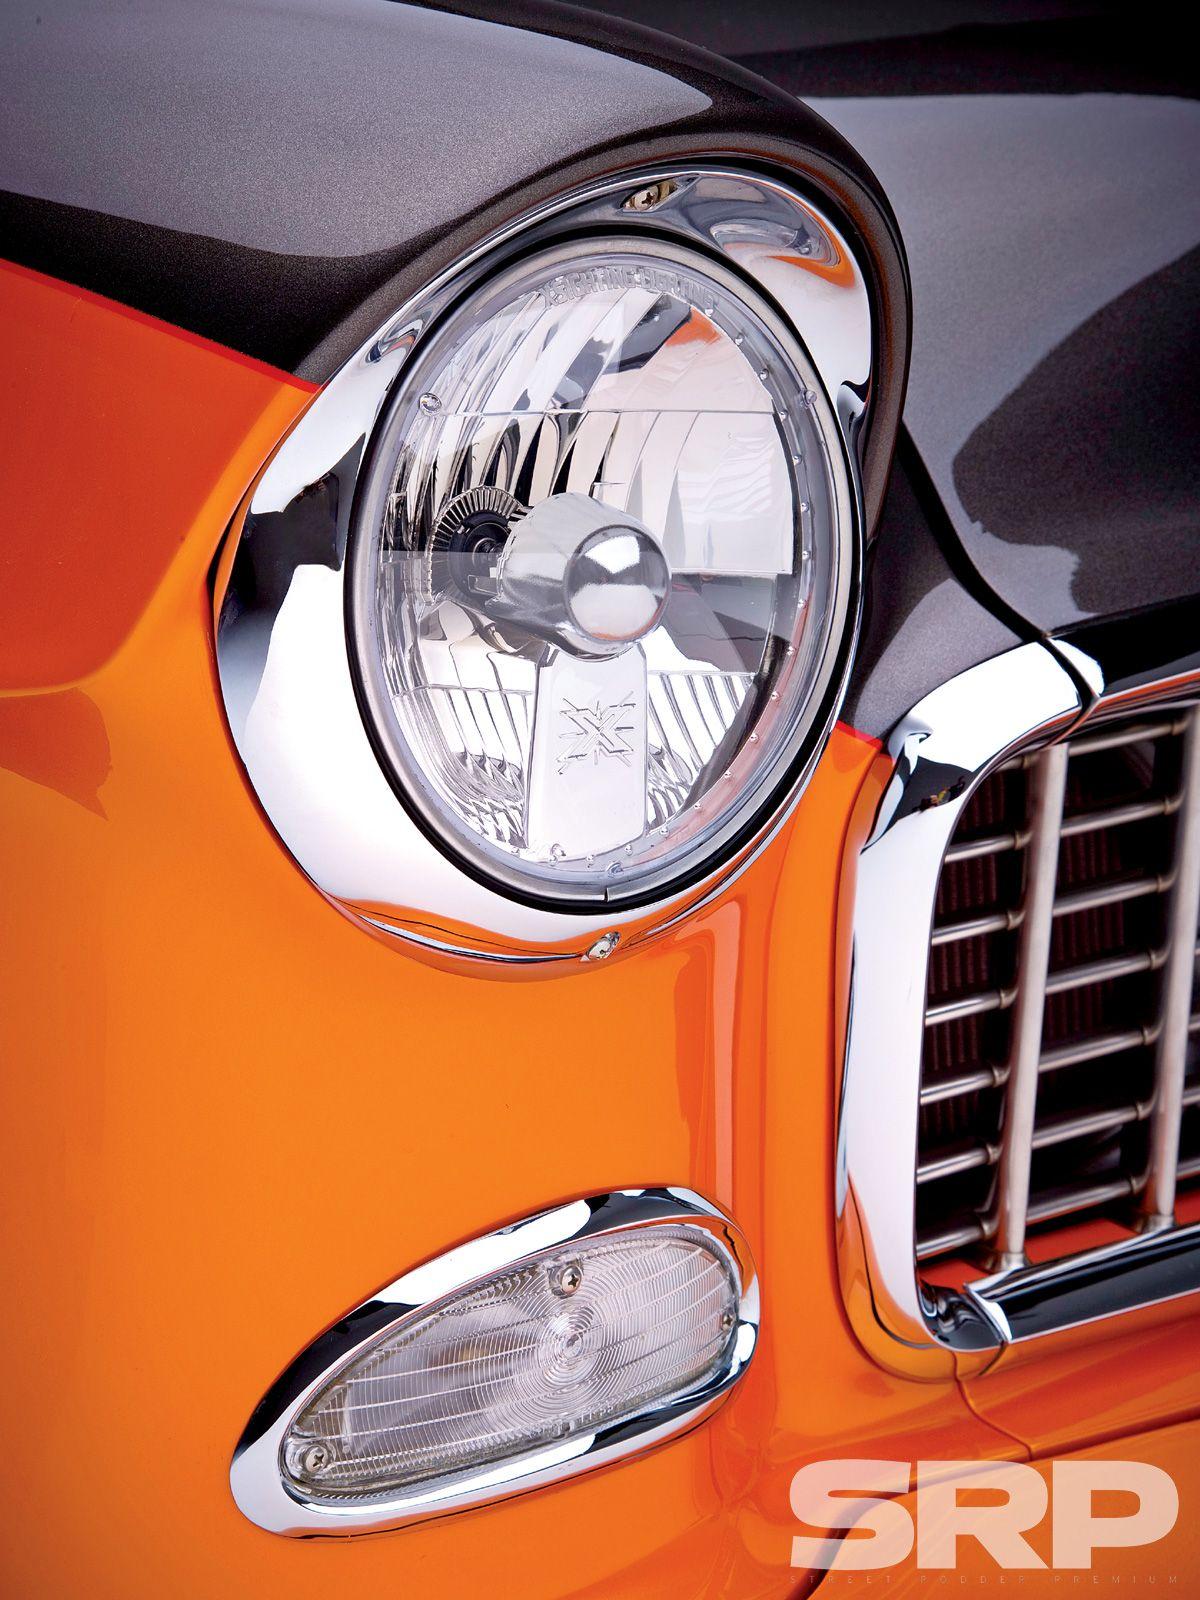 1955 Chevrolet Nomad Custom Headlight 1955 Chevrolet Custom Headlights Chevrolet